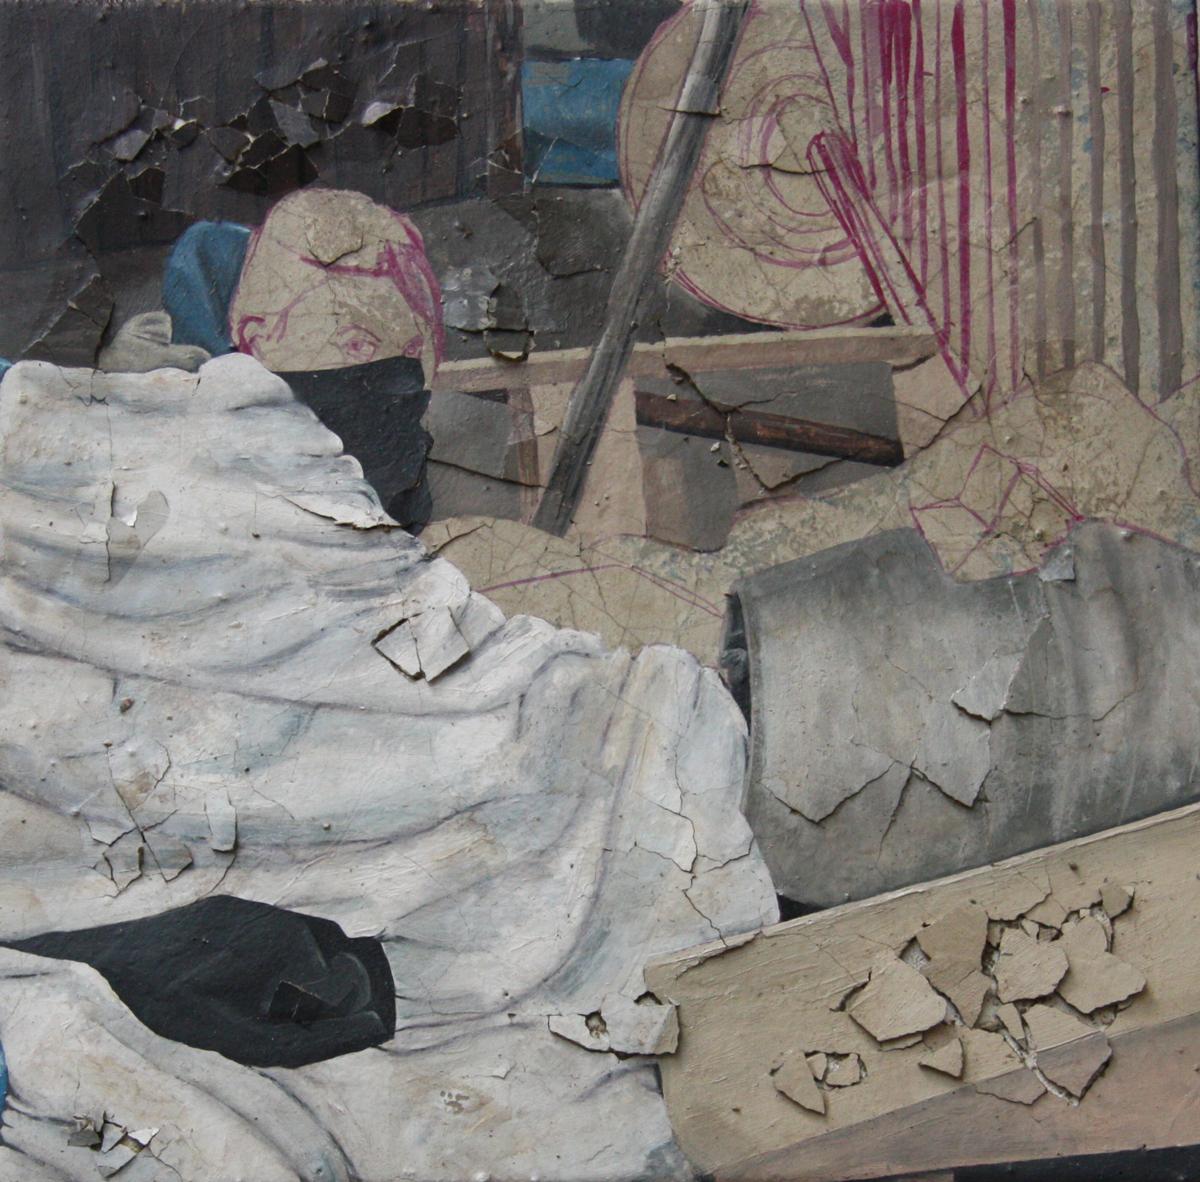 Dana (2011), Fiona Long, oil and concrete on canvas, 50x50cm